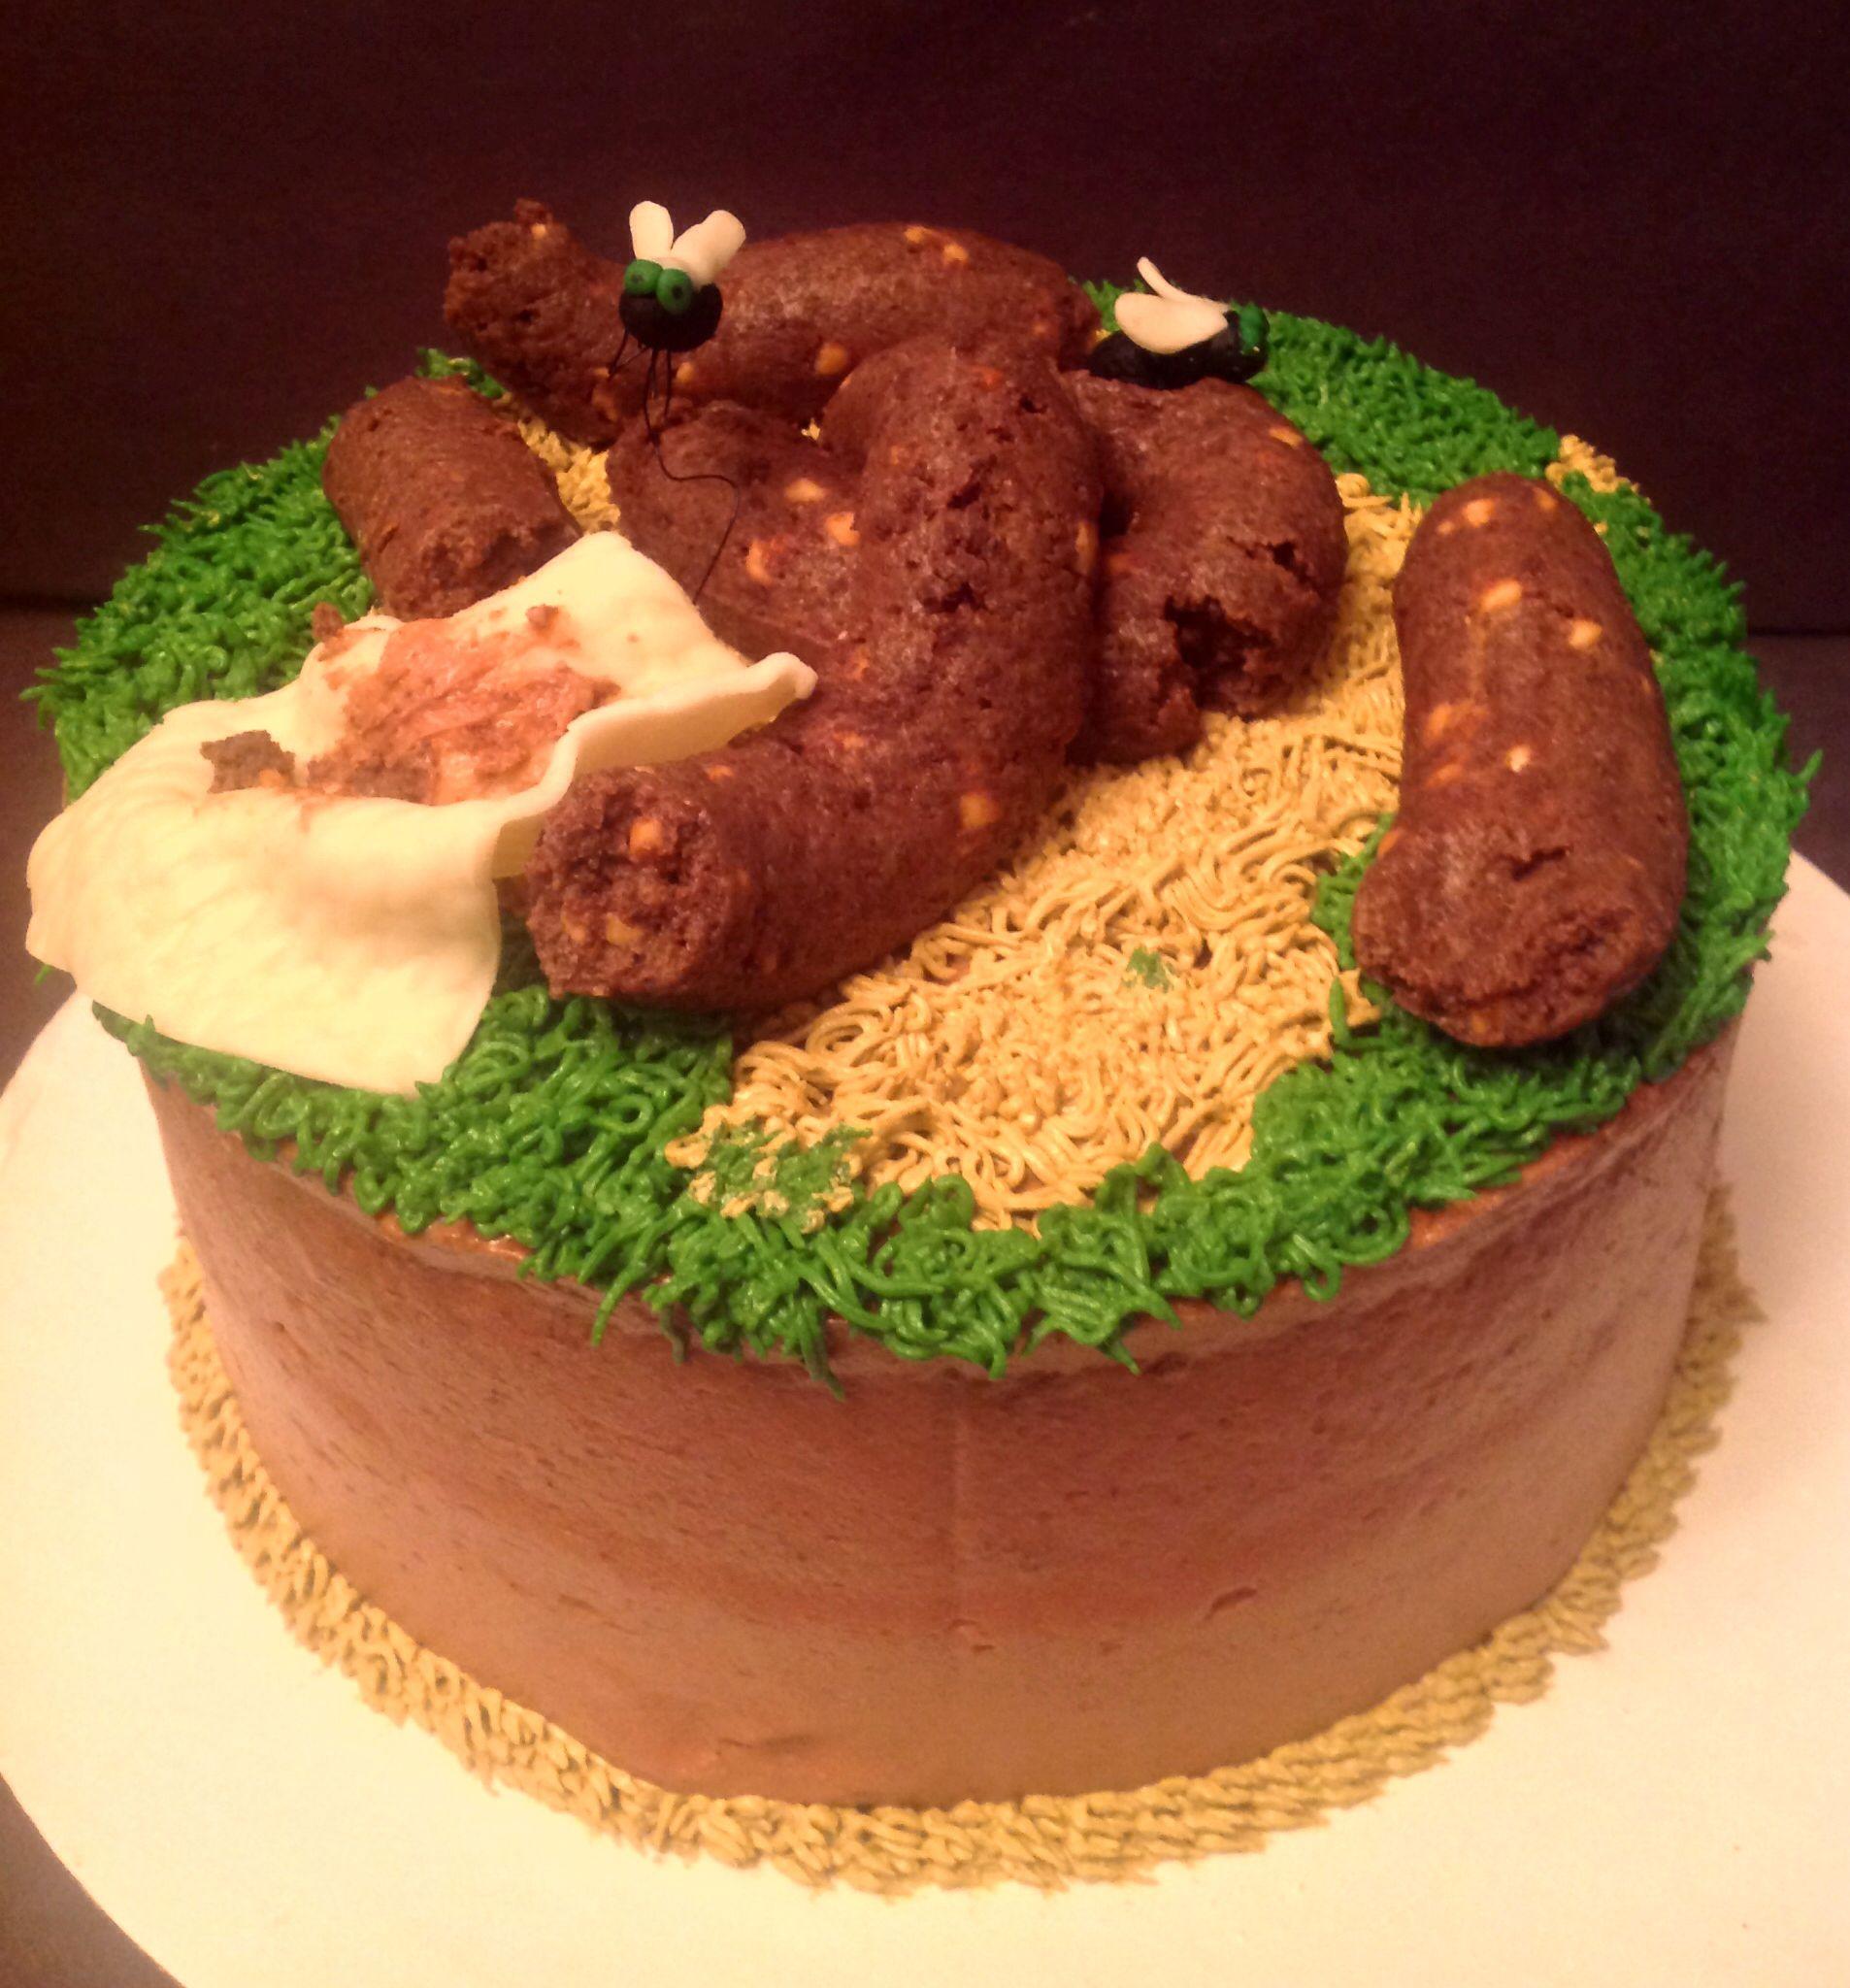 A Fun Joke Poop Cake For Co Worker I Know Gross